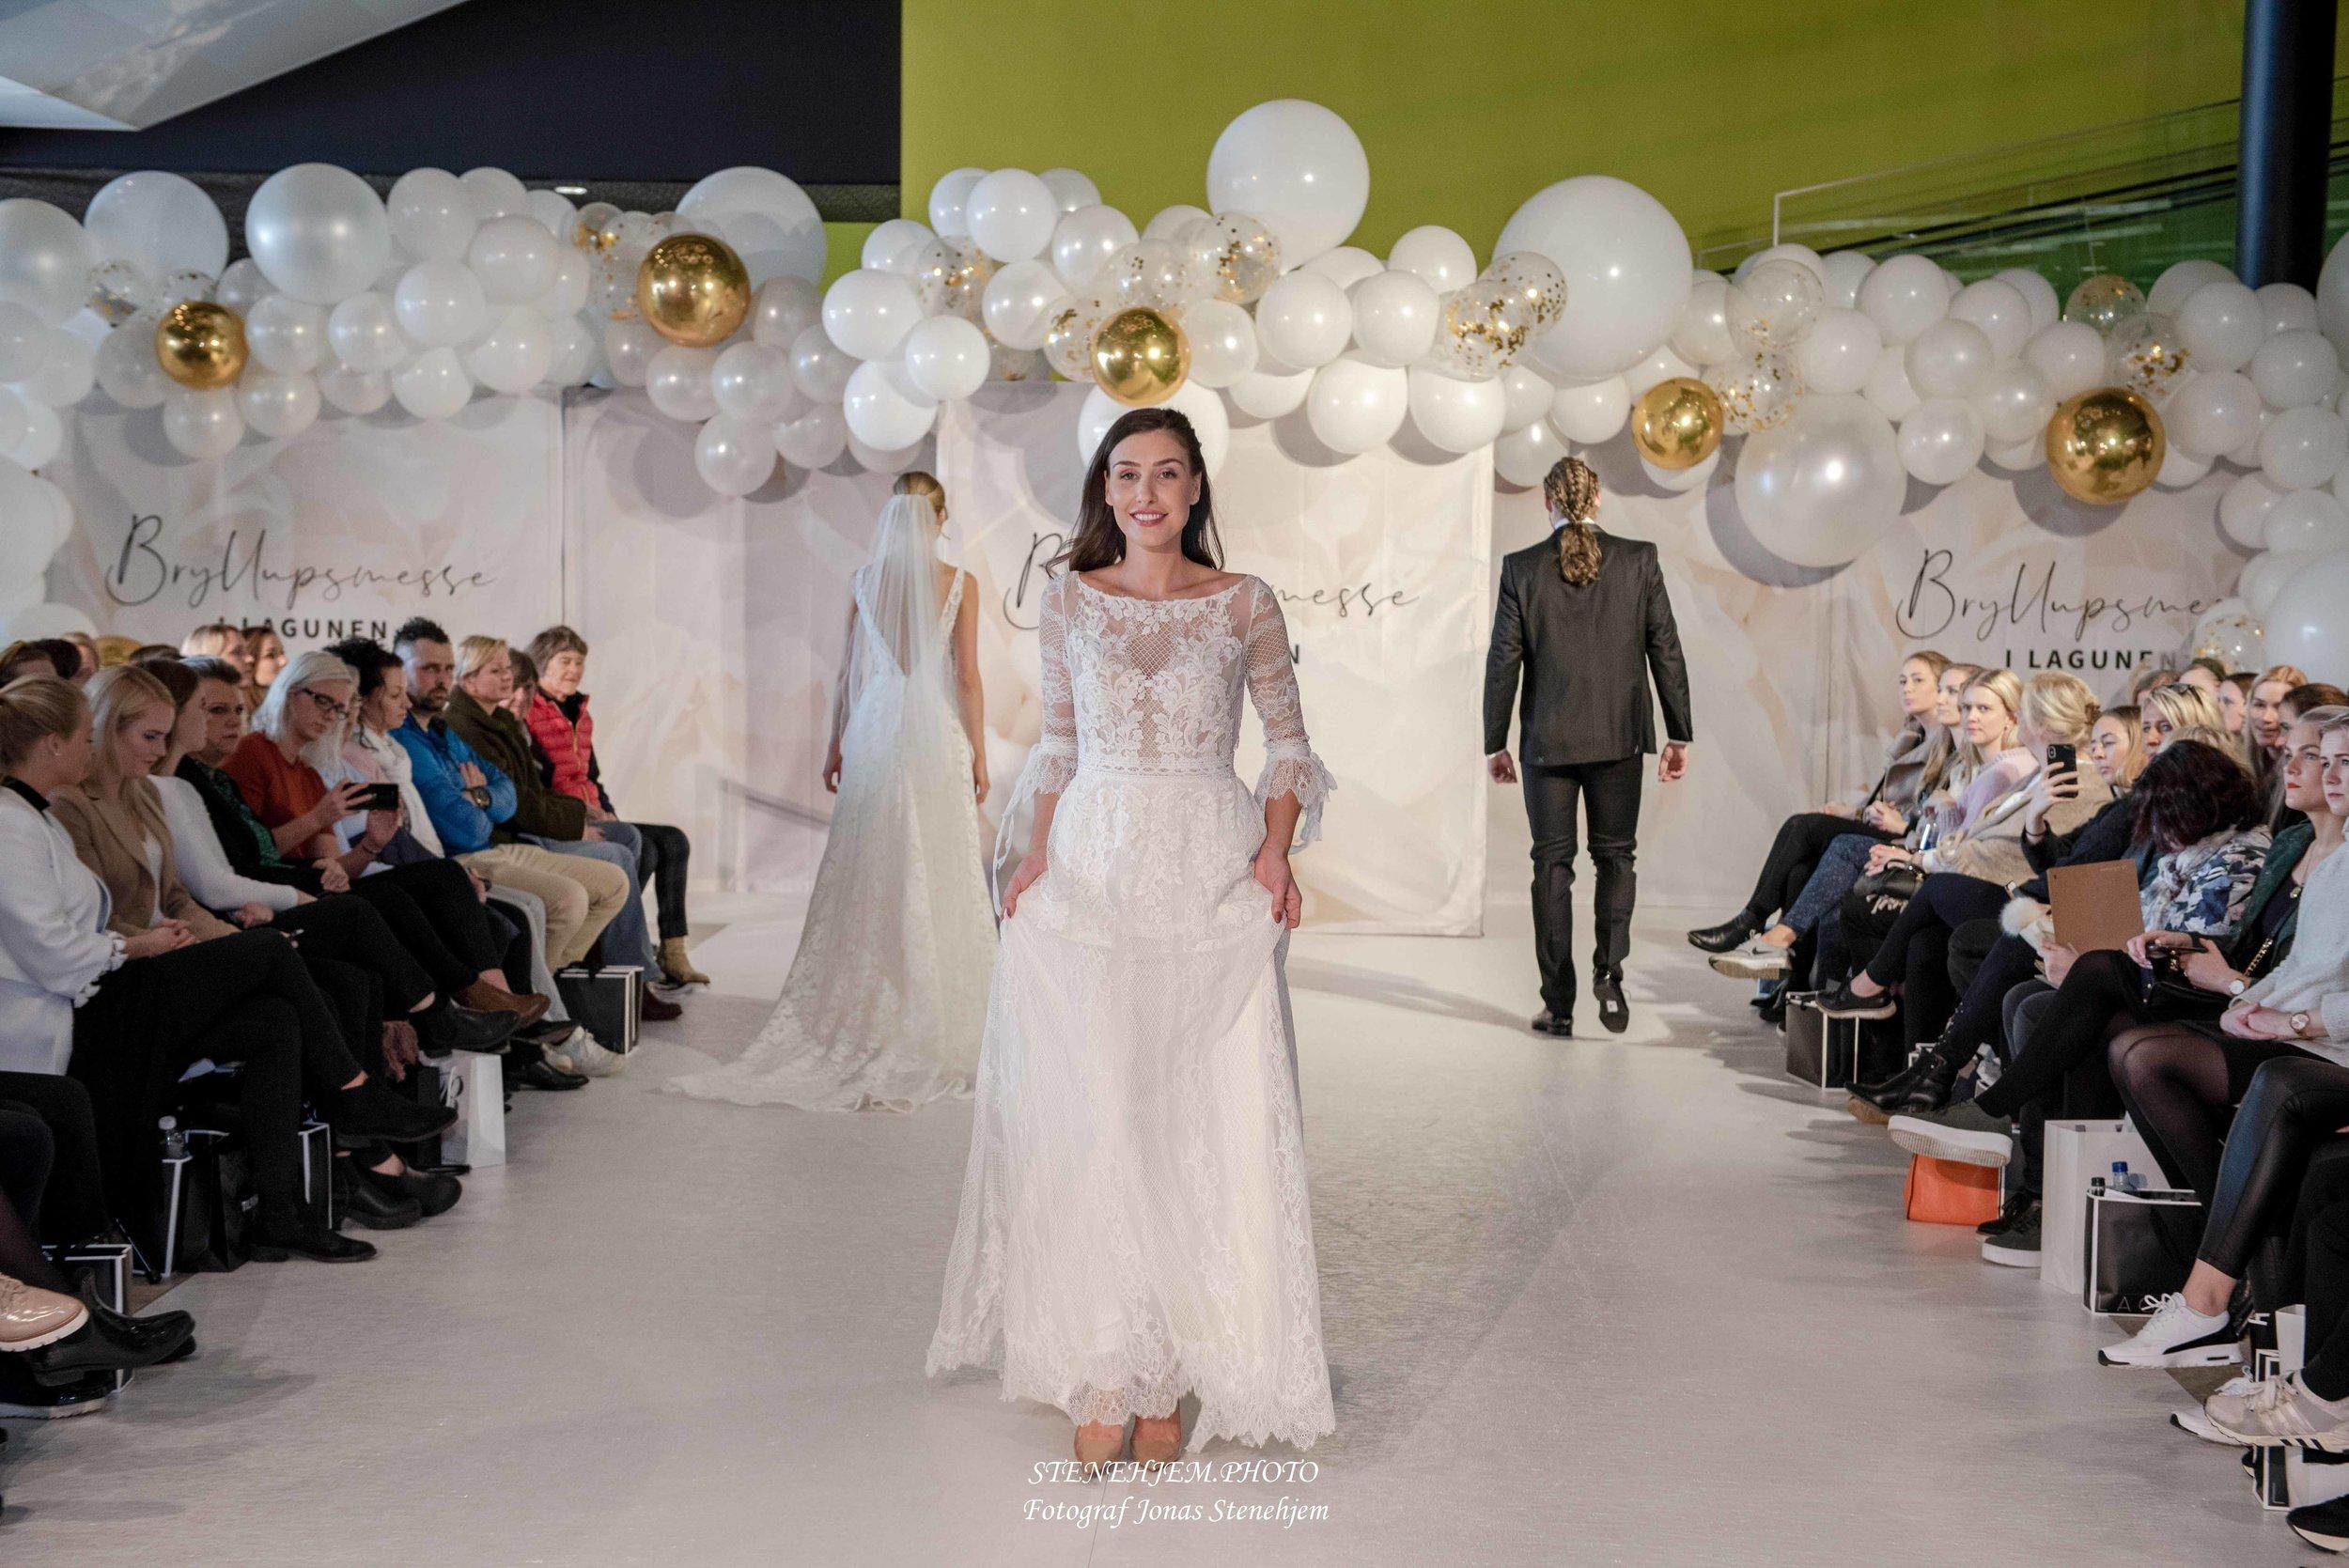 Bryllupsmesse_Lagunen_mittaltweddingfair__072.jpg